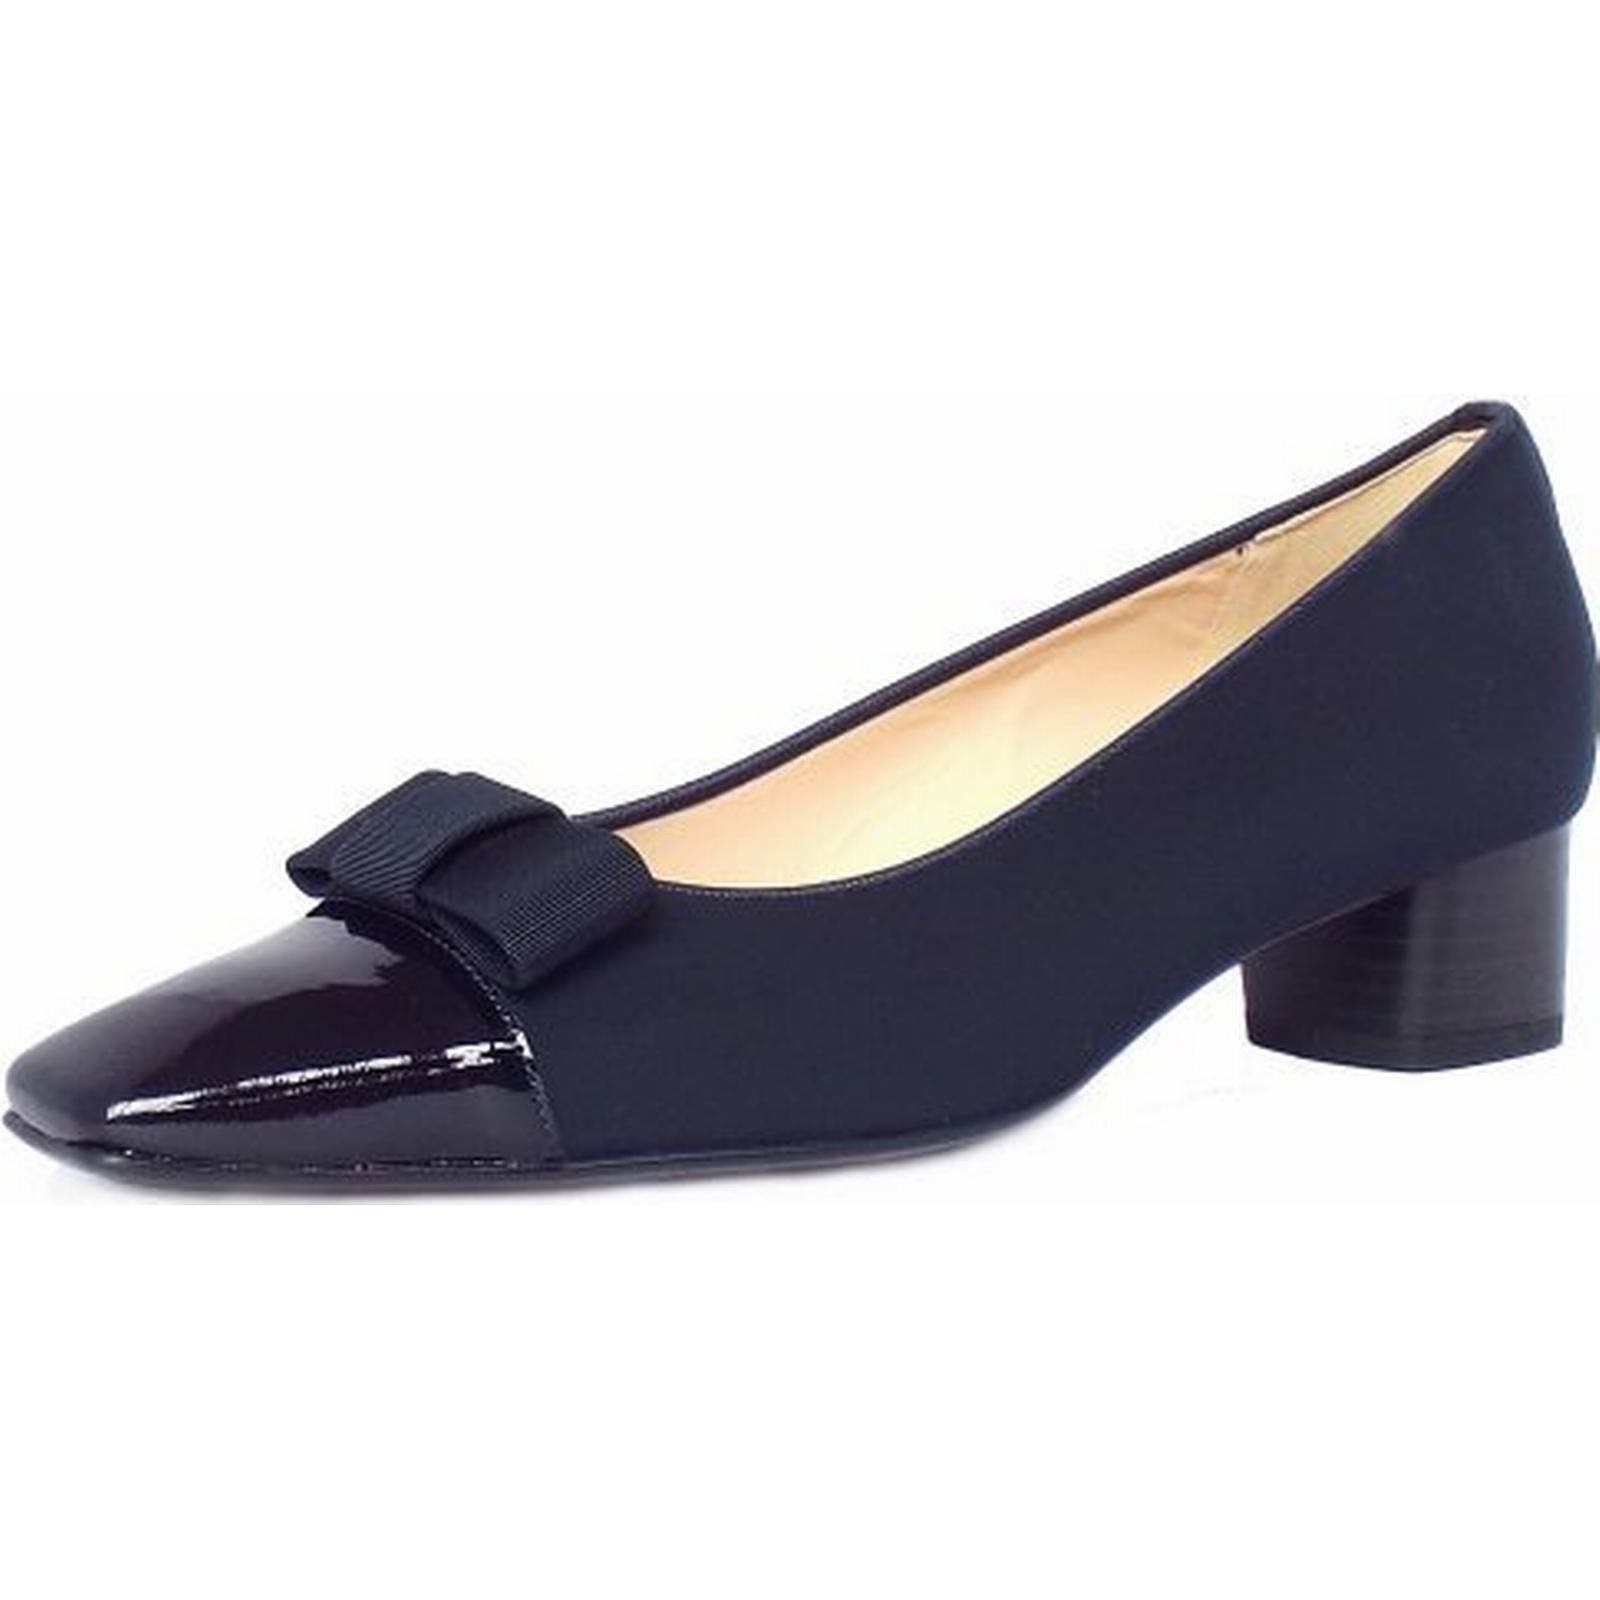 Peter Kaiser Kaiser Peter Beli low heel court shoes in navy Size: 9, Colour: NAVY 4e897b